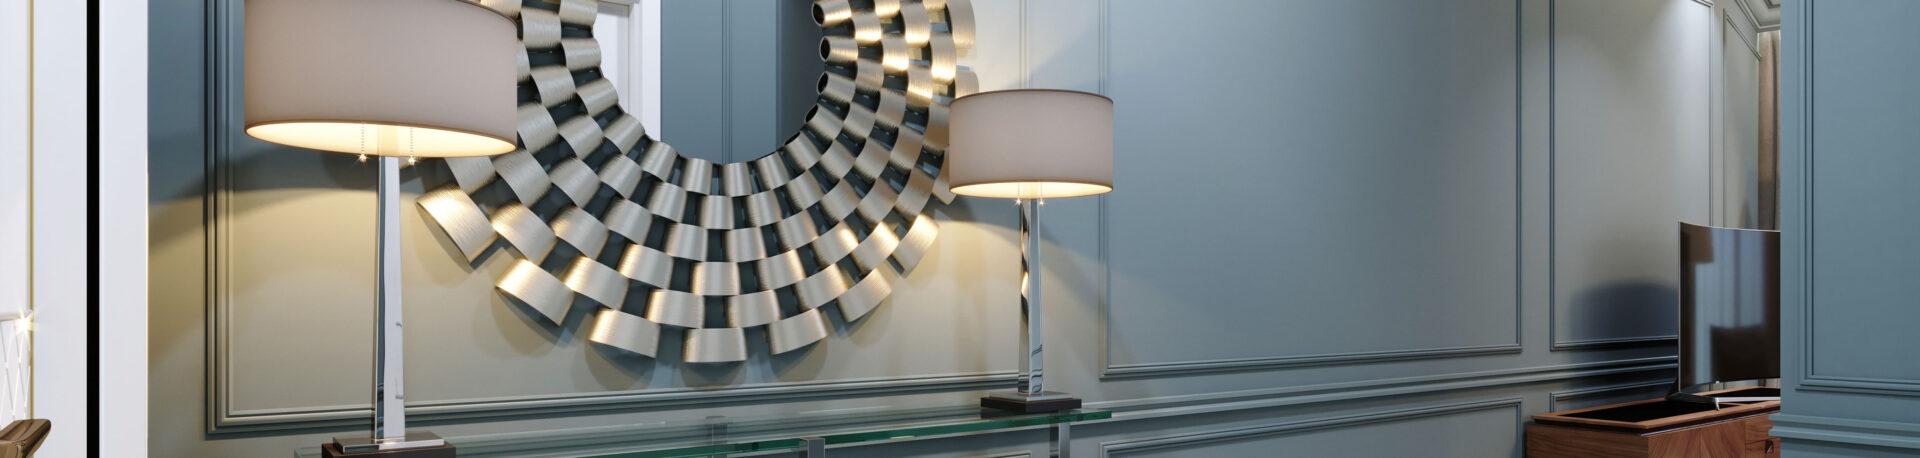 Hallway Lamps